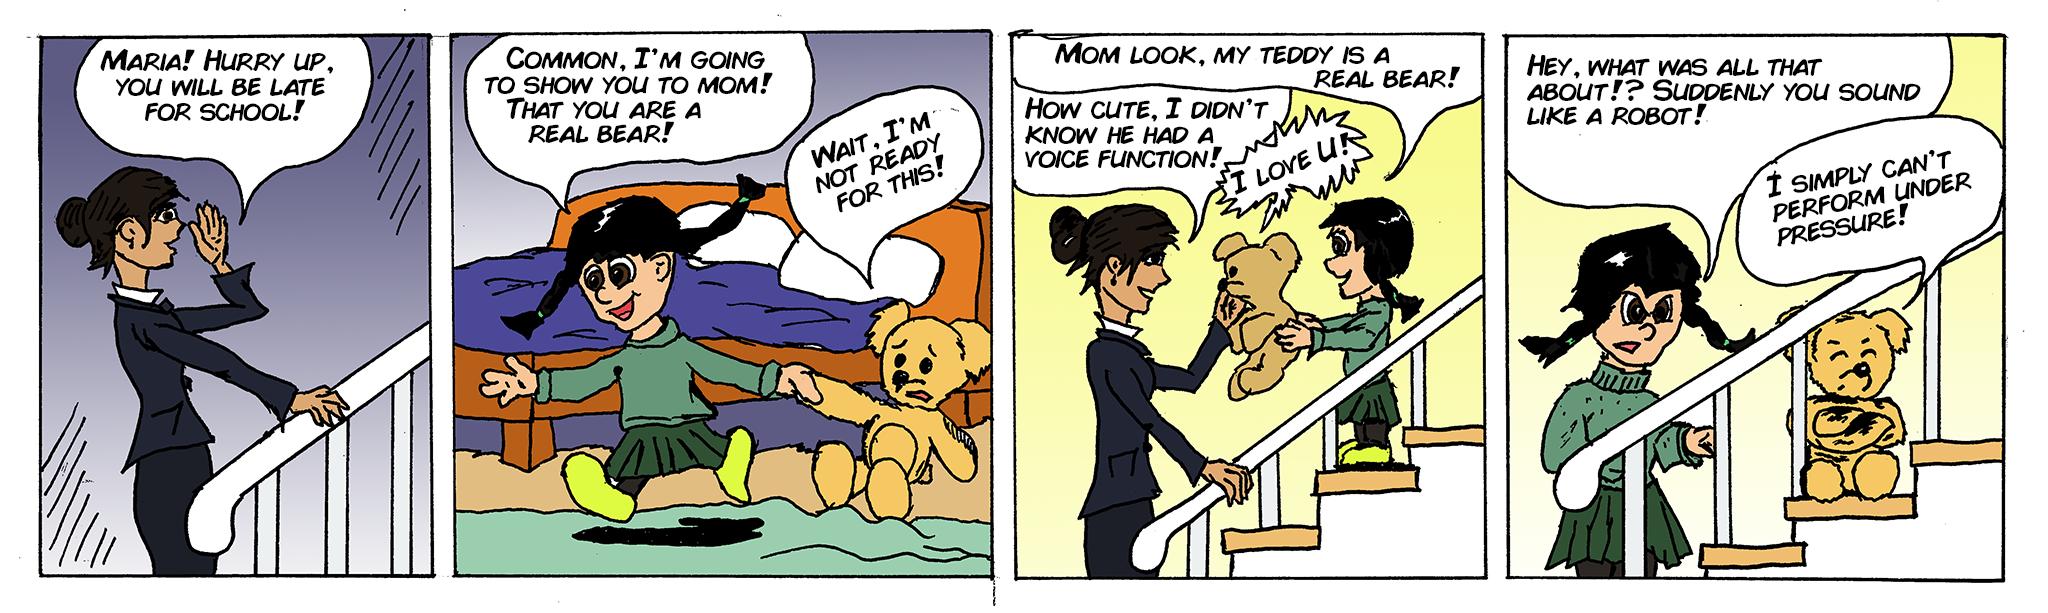 Maria shows Mishka to mom